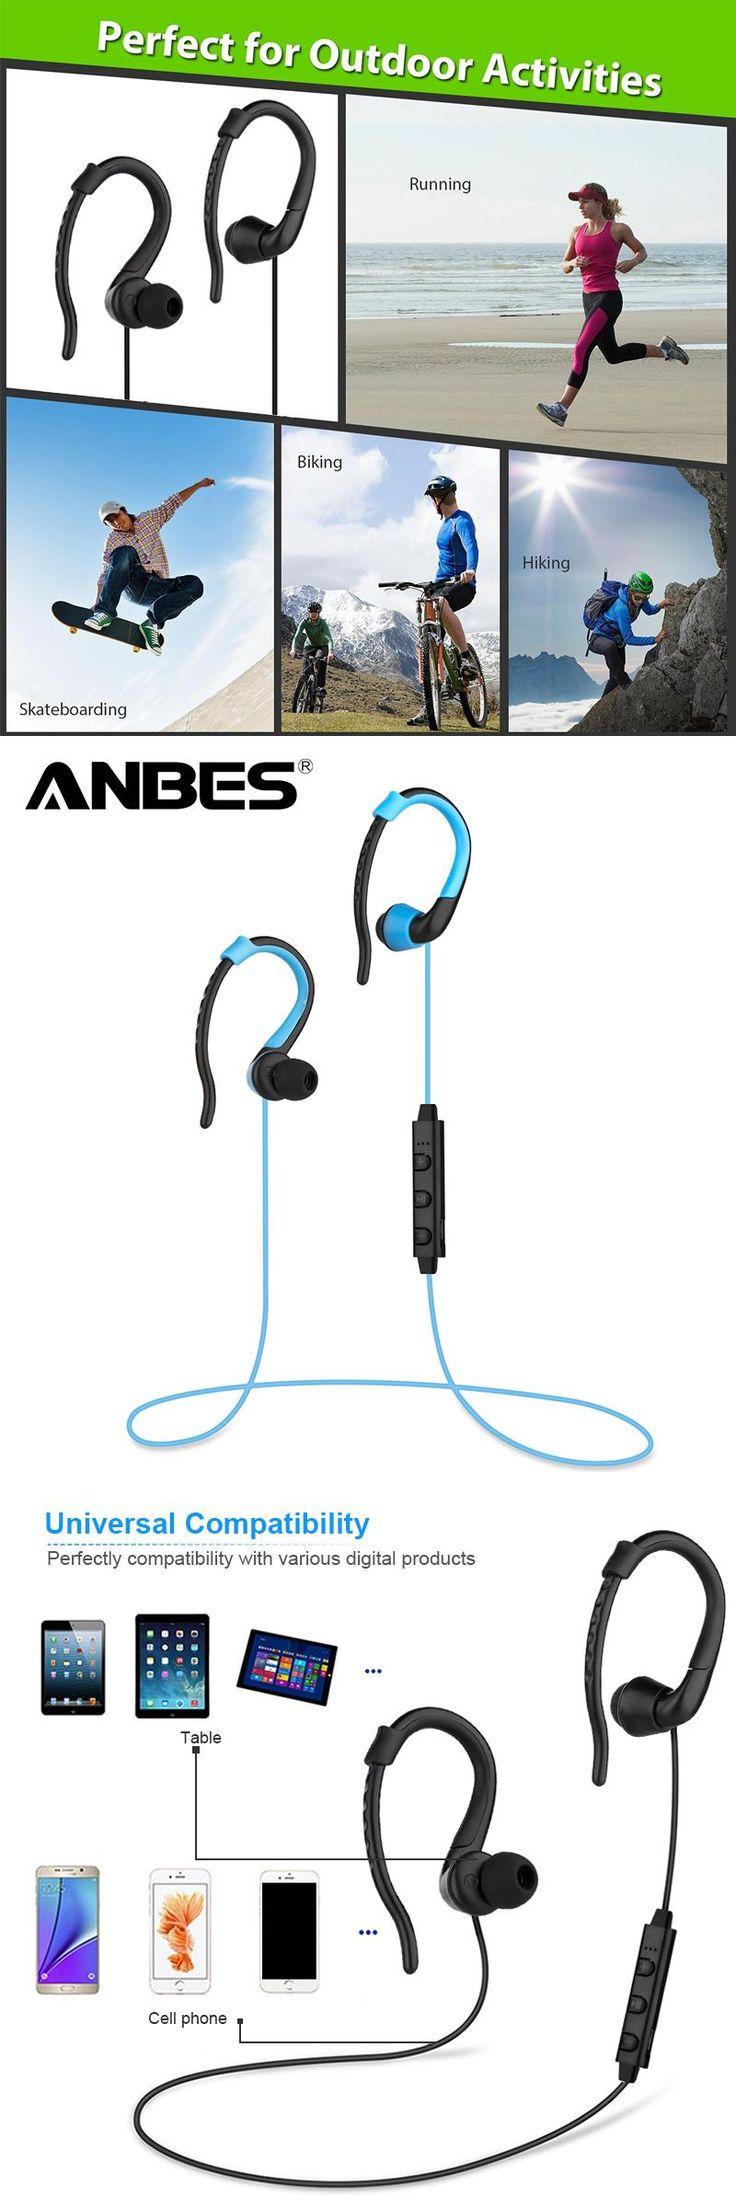 Wireless Headset Bluetooth 4.0 Stereo Ear Phone Sport Bluetooth Headphone Earphone for iPhone Samsung Audifonos